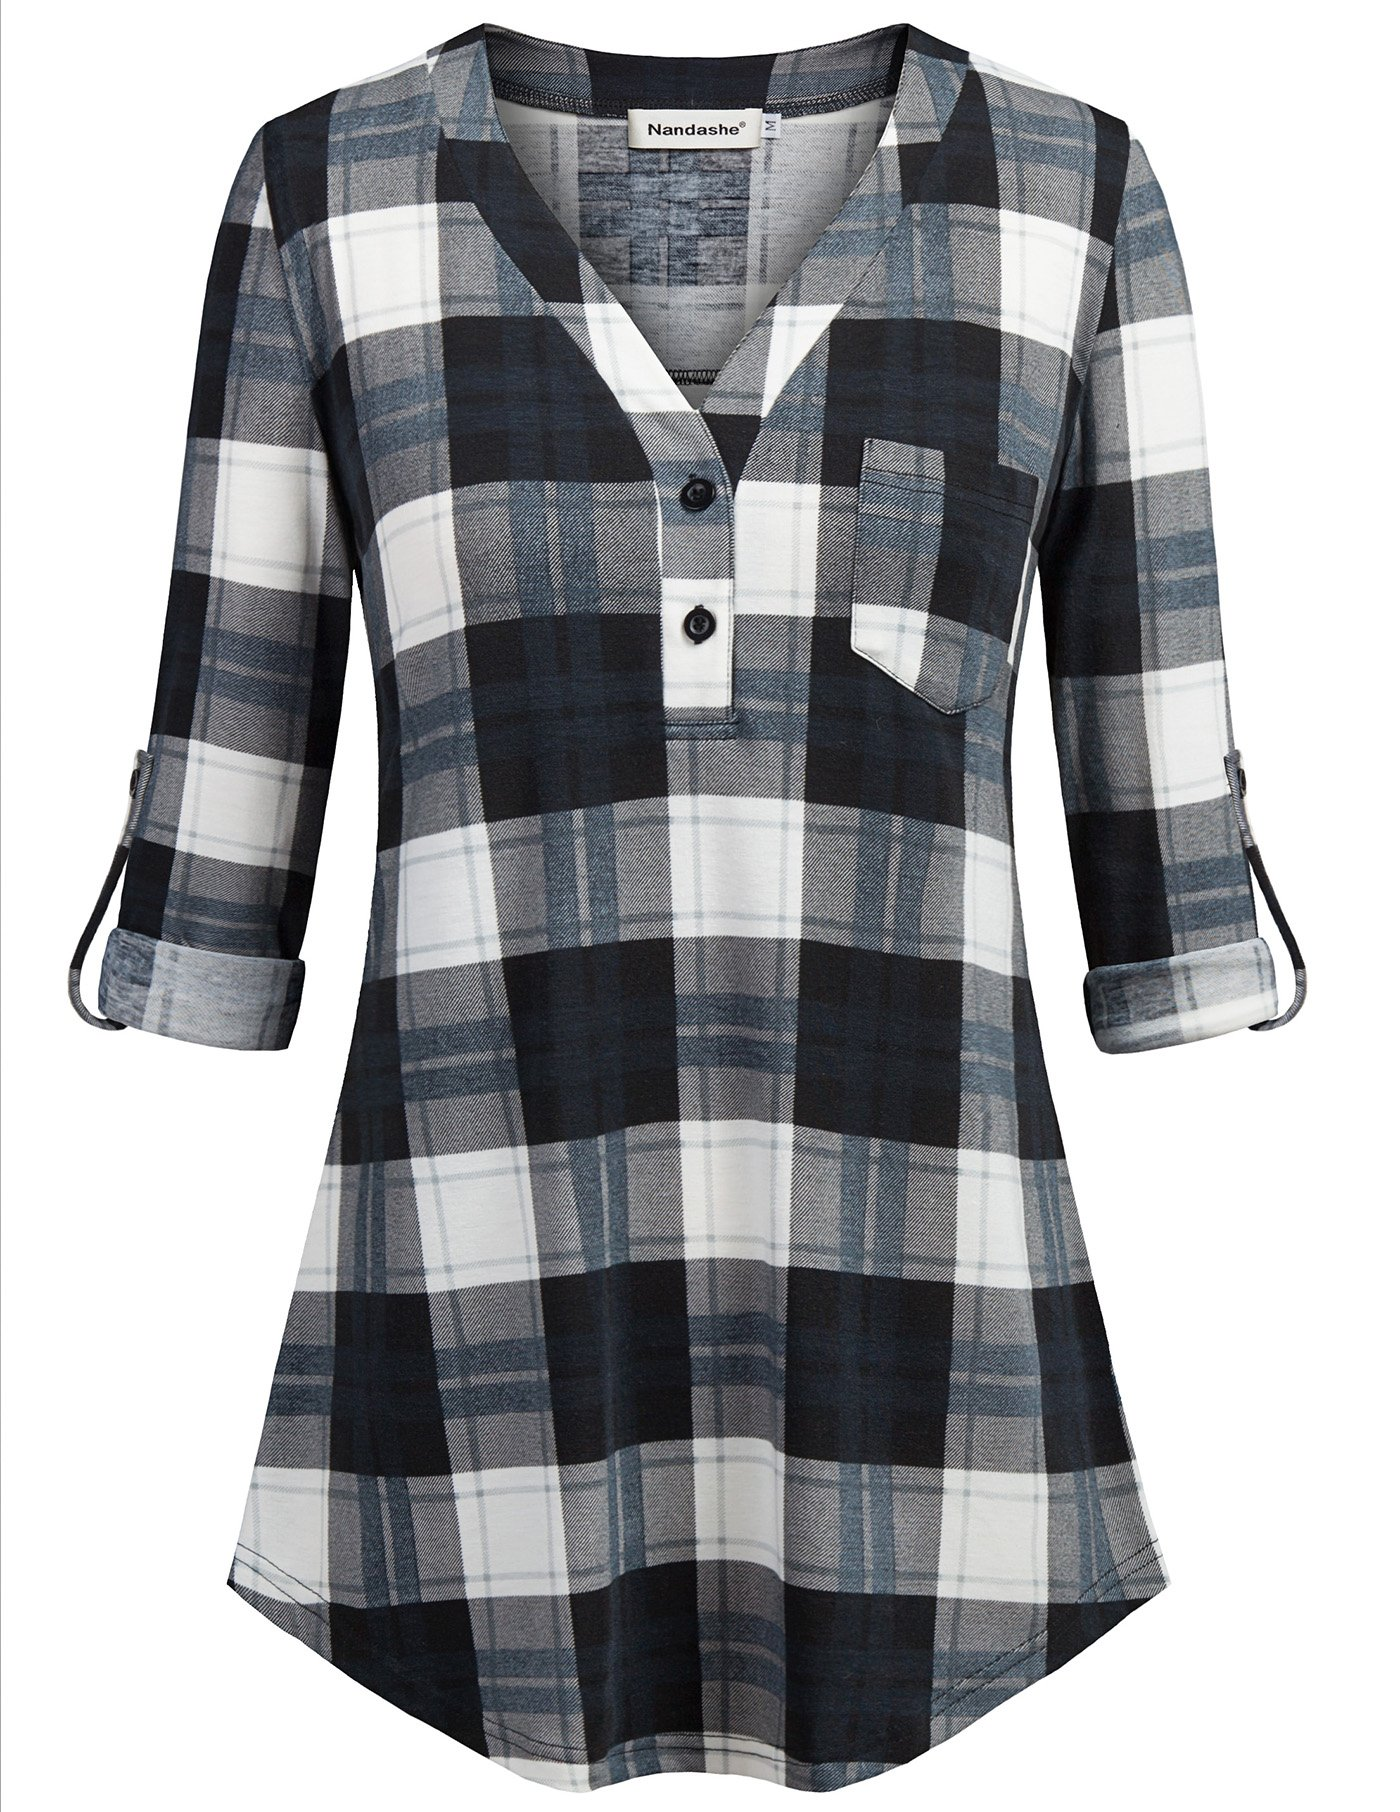 Nandashe Tartan Plaid Shirt, Petite Girls 3/4 Sleeve Roll up Boyfriend Style Knitted Lightweight Soft Gingham Multicolor Checked Tunic Blouse Blue White 1x